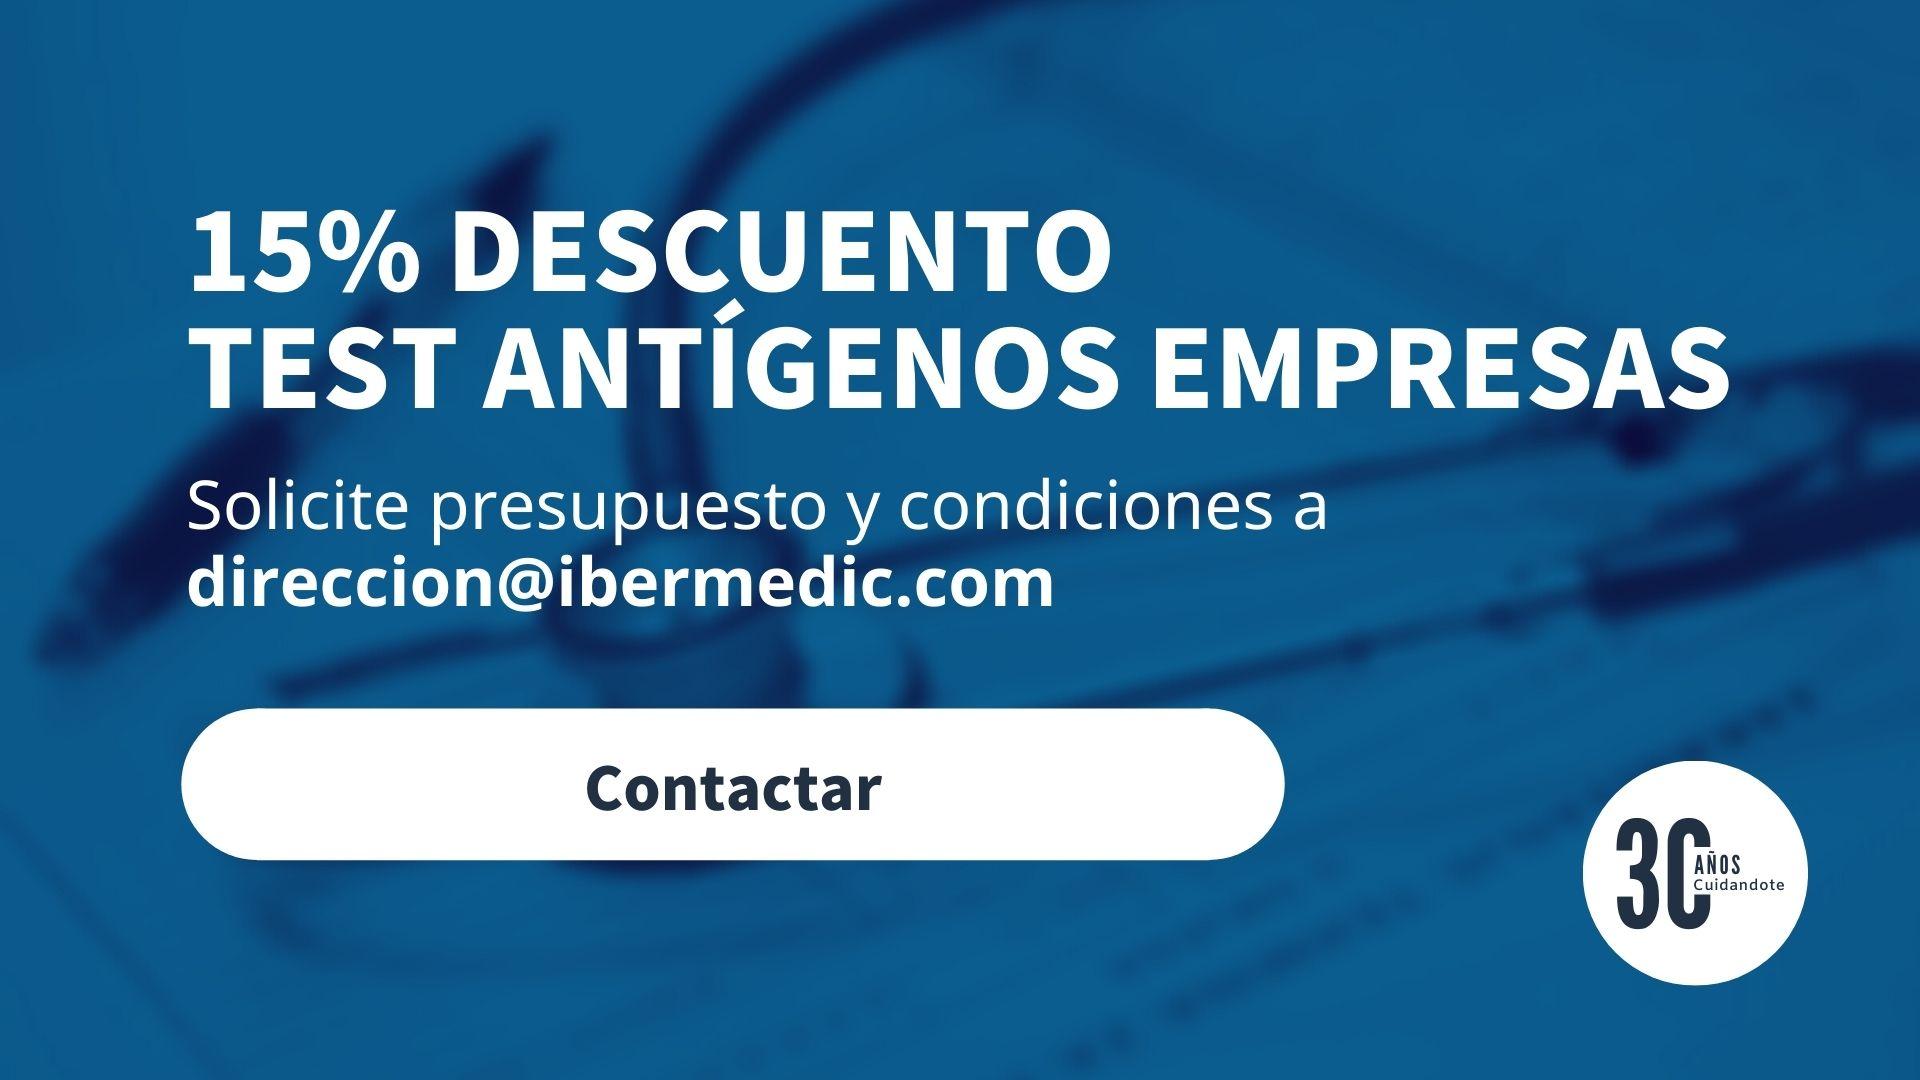 Phone Ibermedic Banner Test Antigenos Empresa Descuento